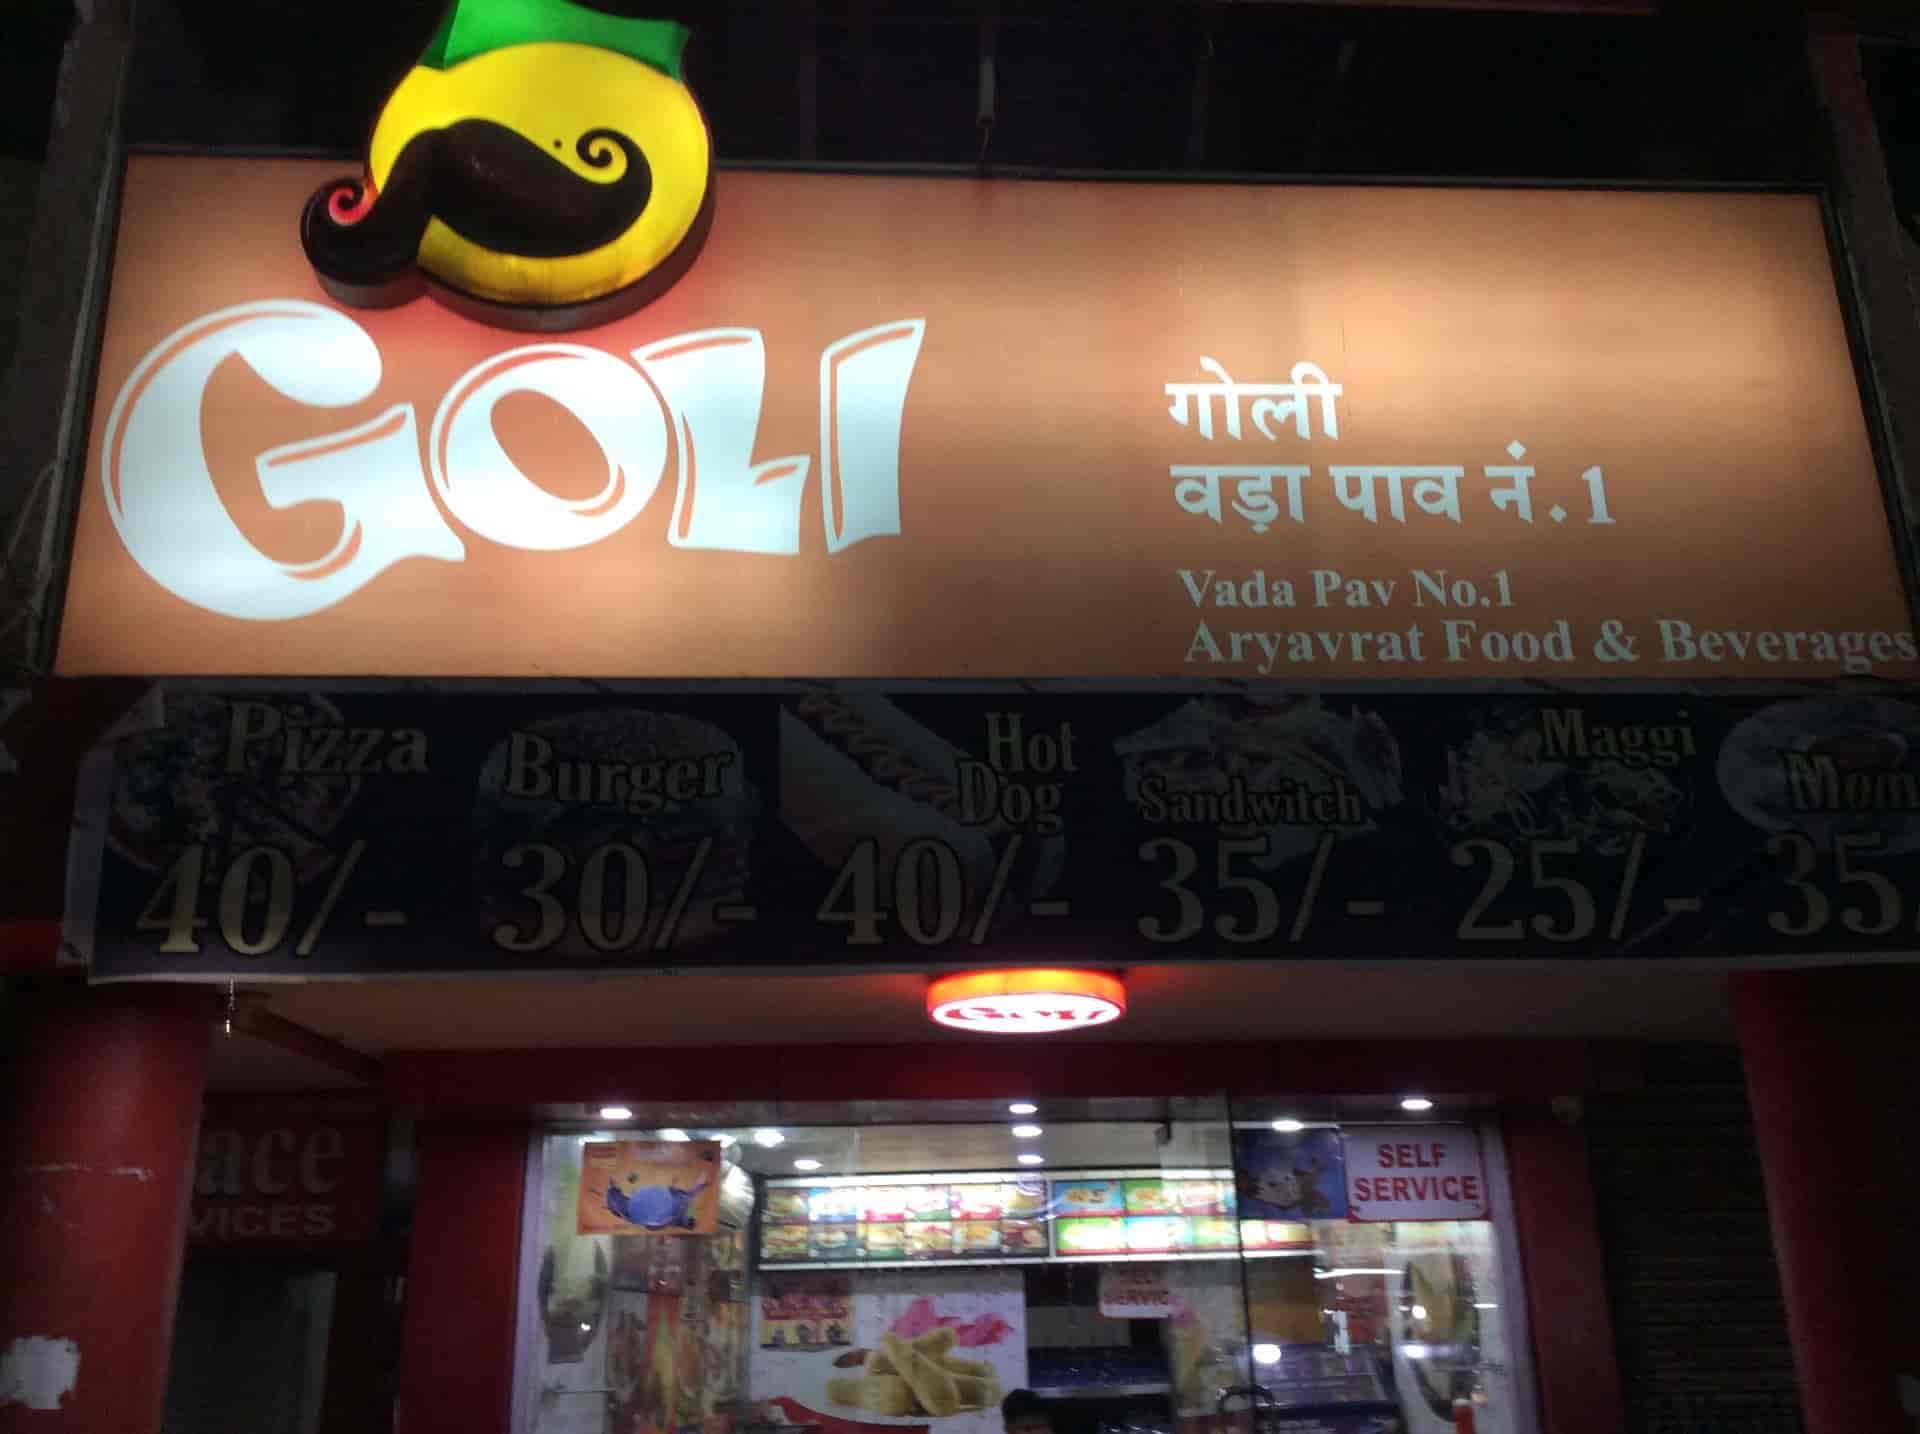 Goli Vada Pav, Marhatal, Jabalpur - Restaurants - Justdial